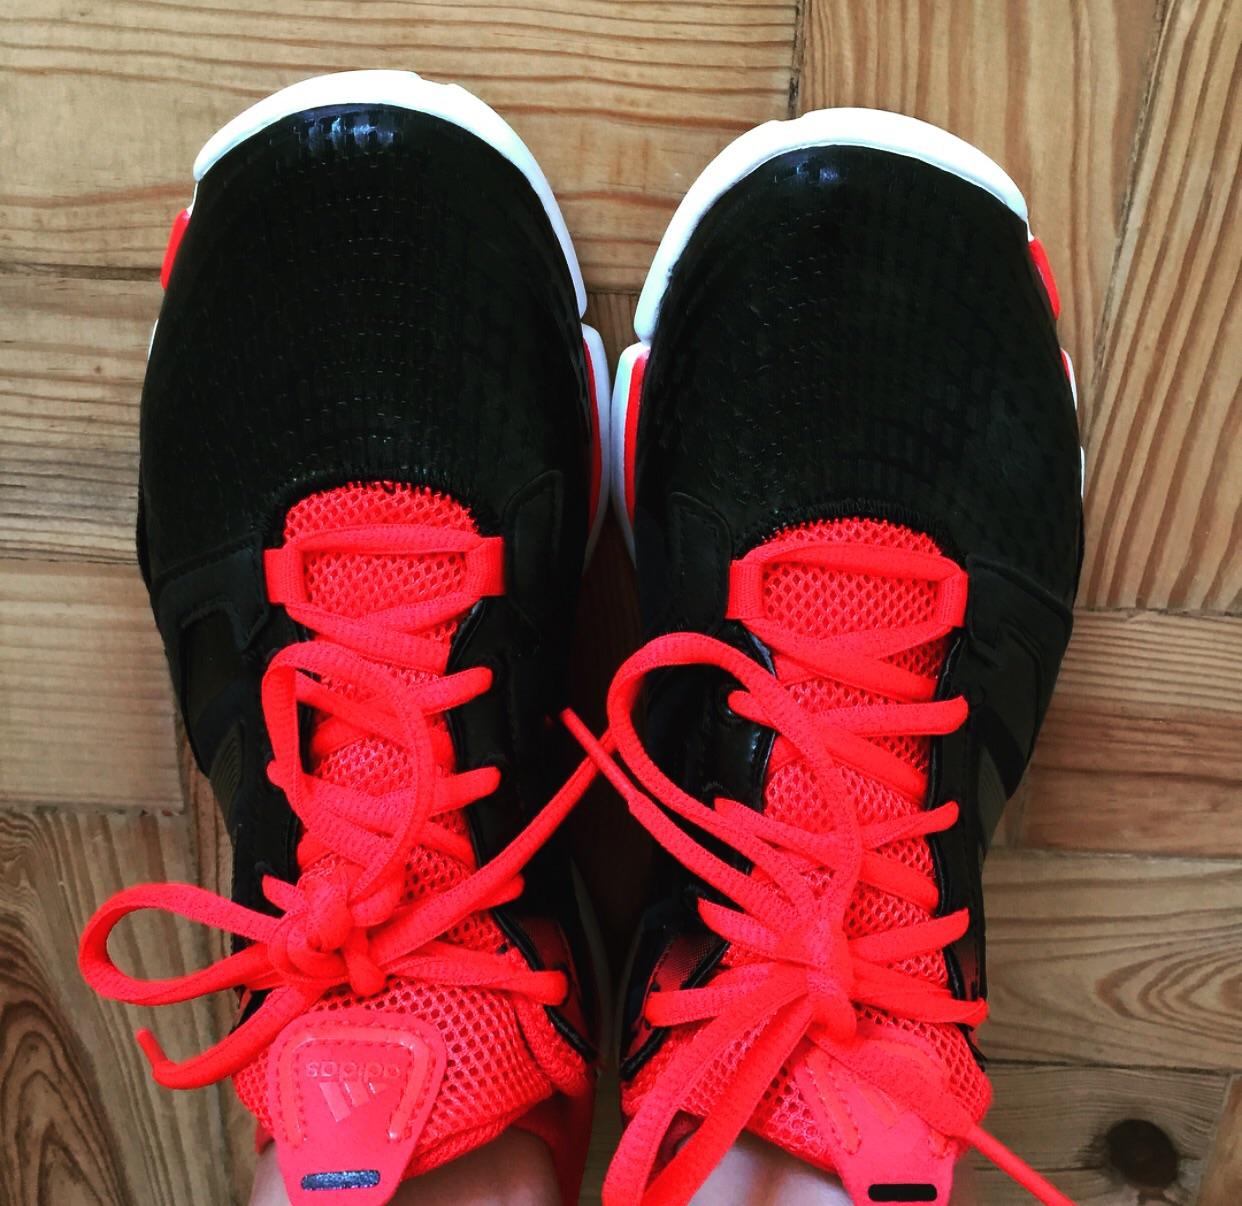 New Kicks. To kick the Fitness season!